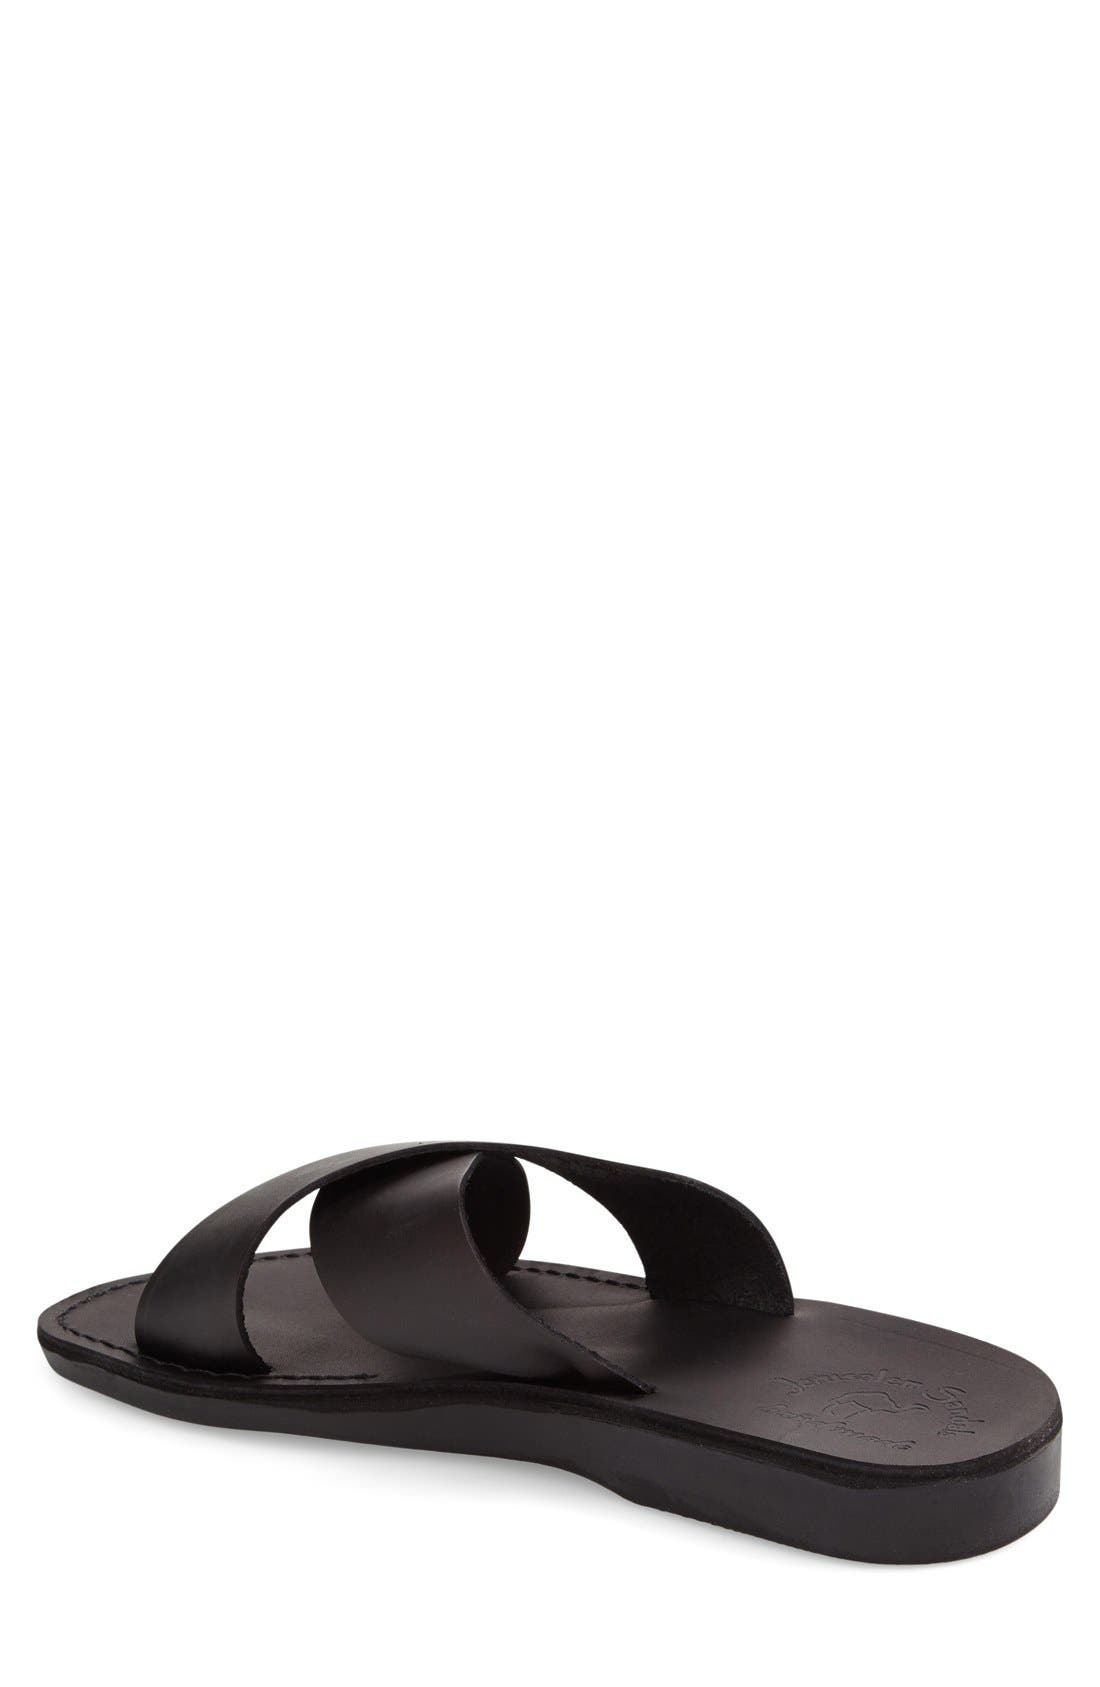 'Elan' Slide Sandal,                             Alternate thumbnail 2, color,                             BLACK LEATHER